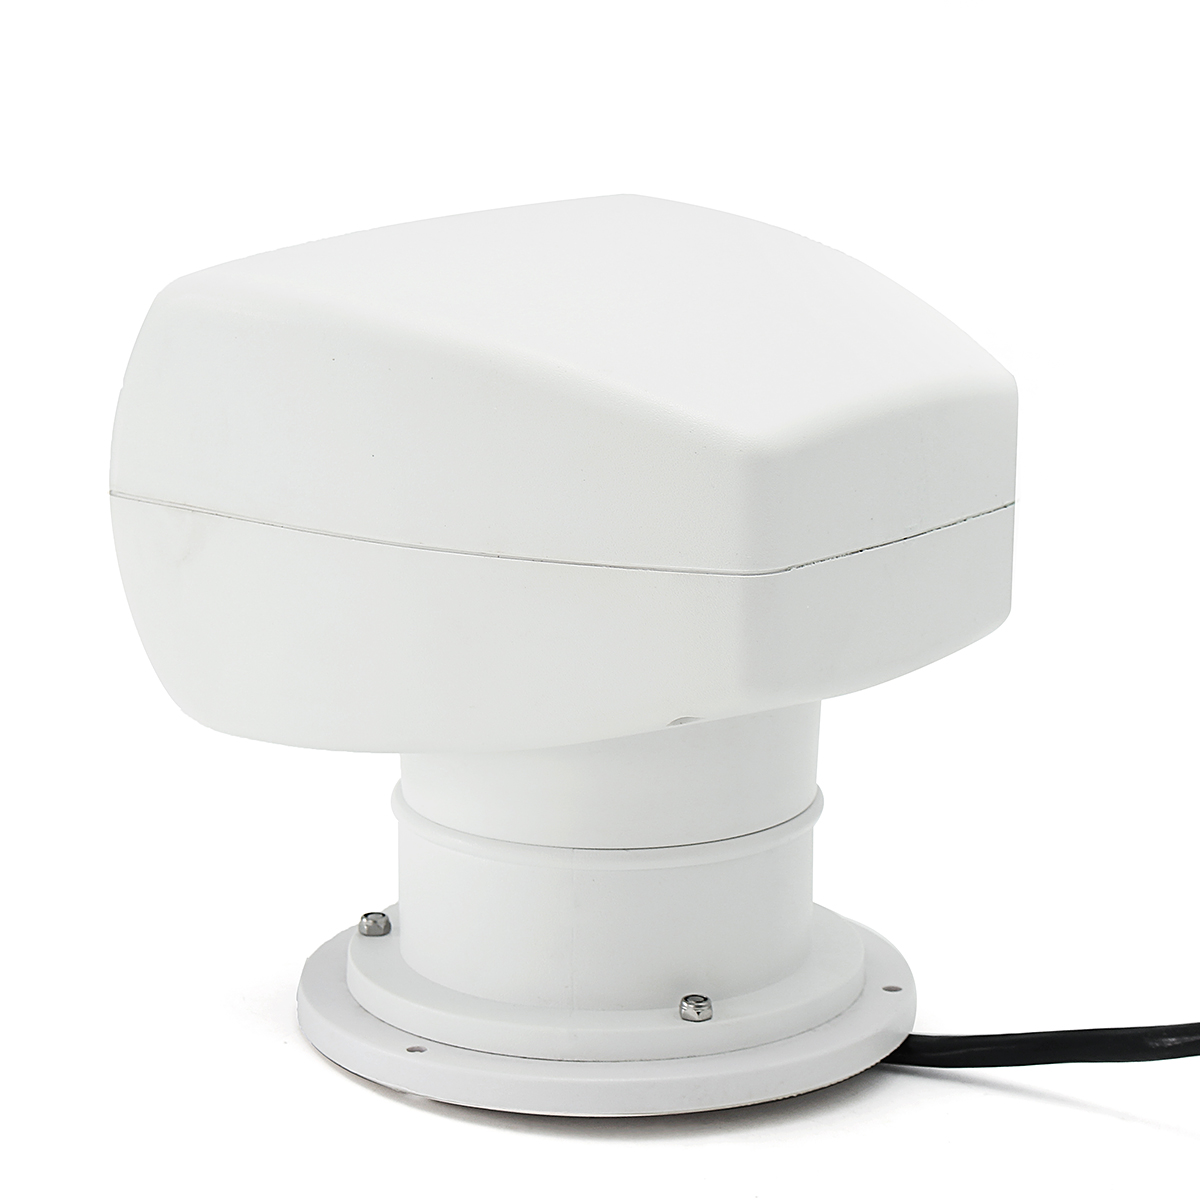 Image 5 - Smuxi Spotlight 12V 100W 2500LM 3200K Marine Searchlight Light Bulb PC+Aluminum Remote Control Multi angled White-in LED Spotlights from Lights & Lighting